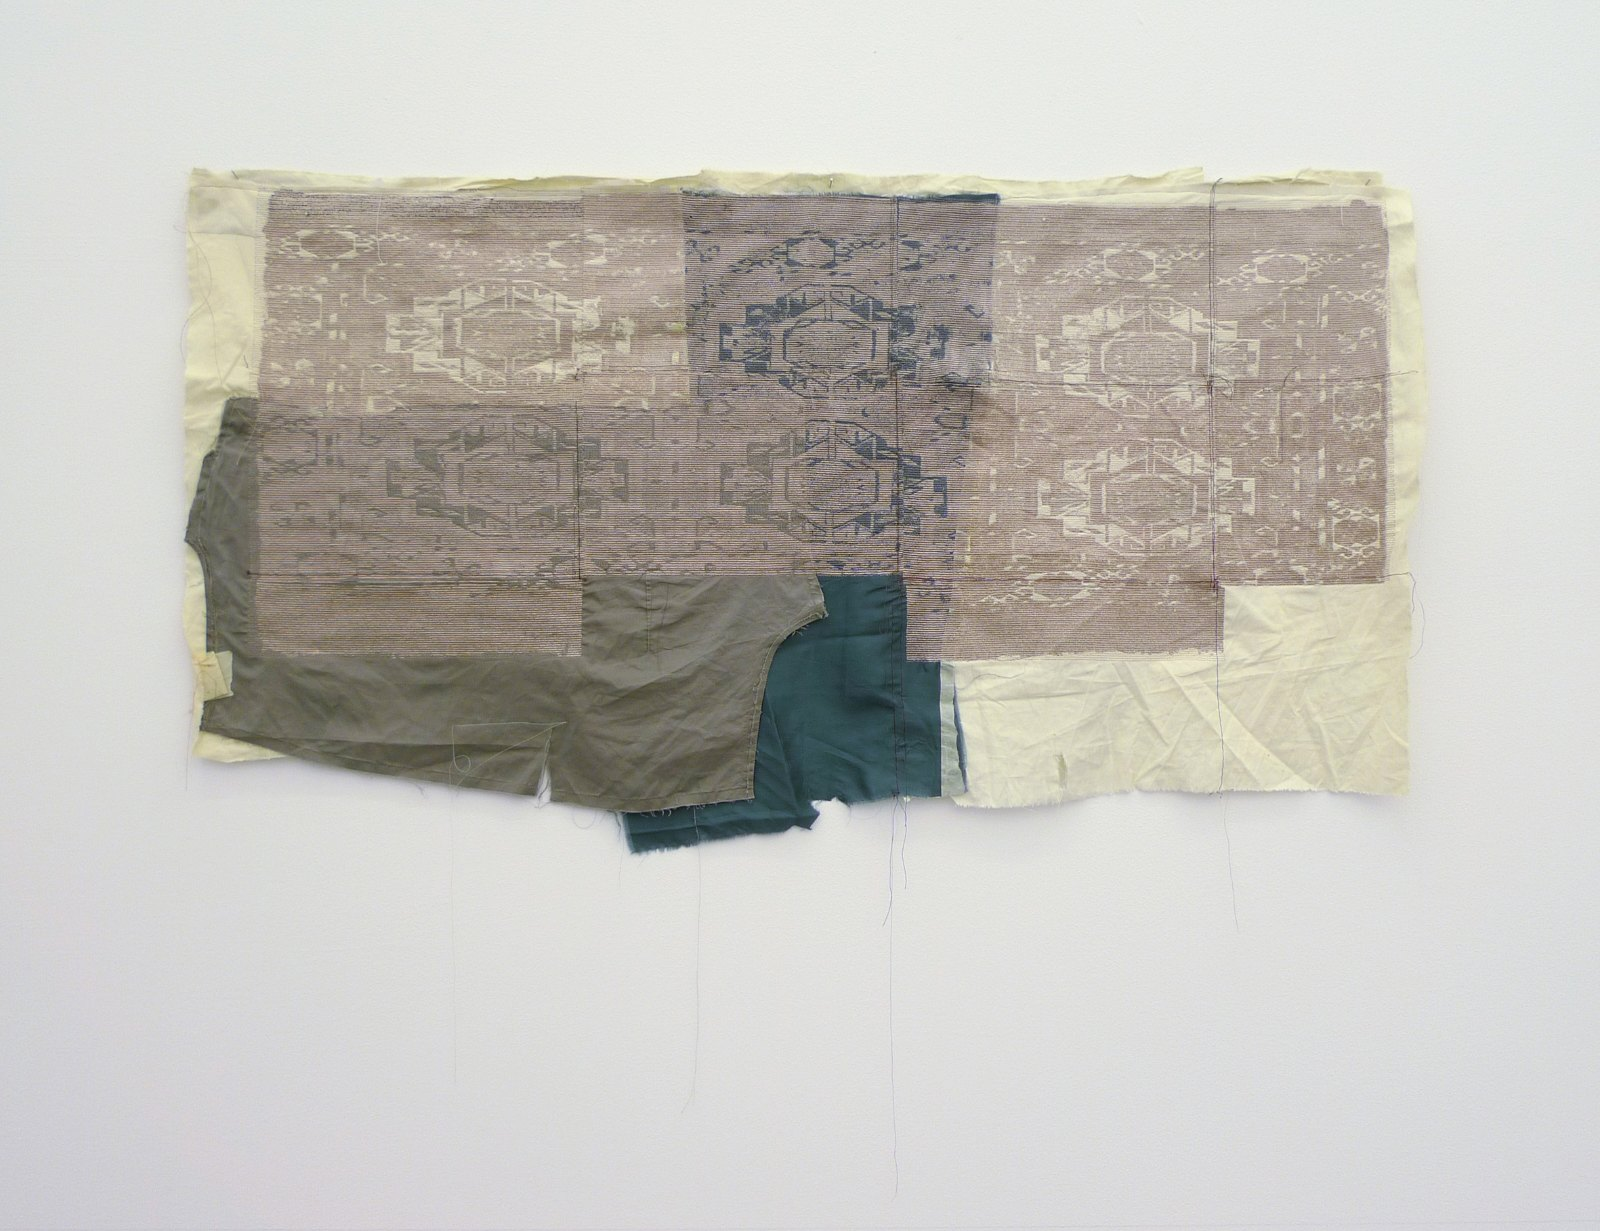 Torba, Tekke, 2010, embroidery on various textiles